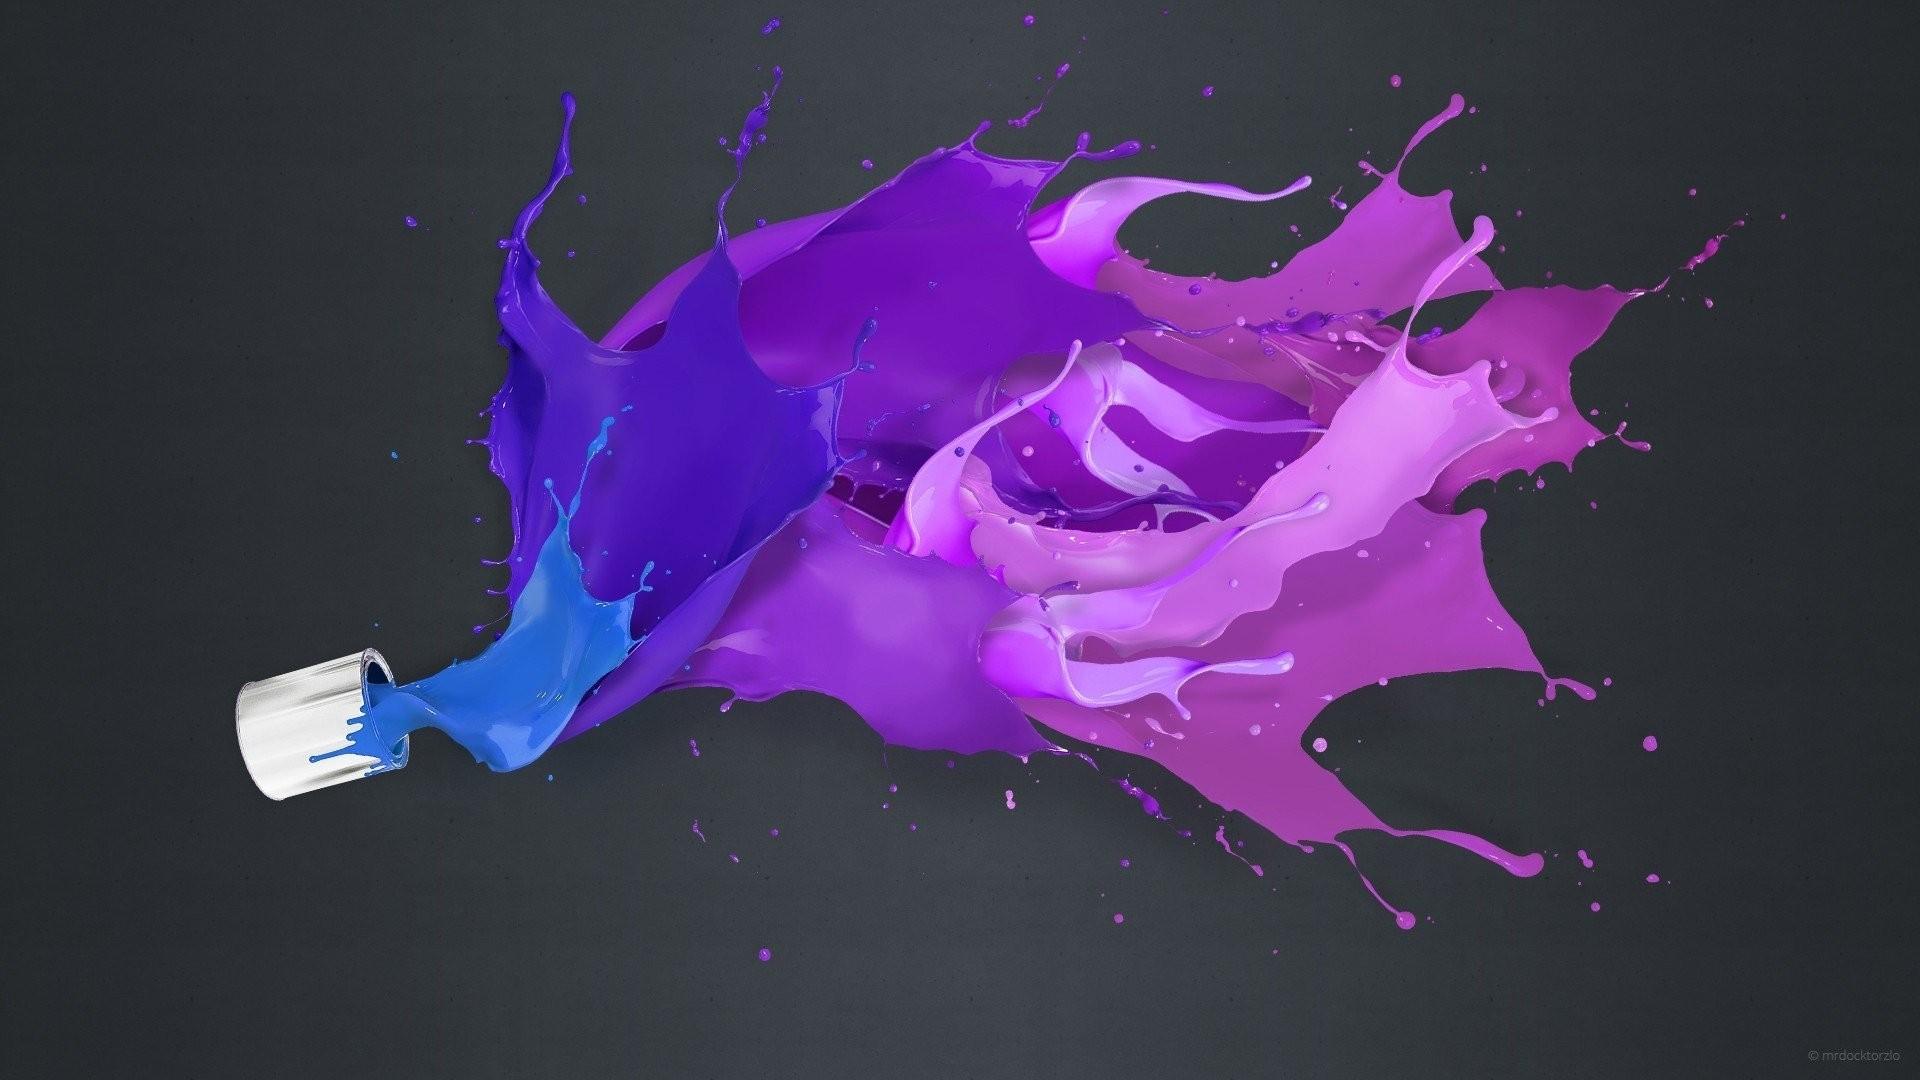 Paint Splash PC Wallpaper HD